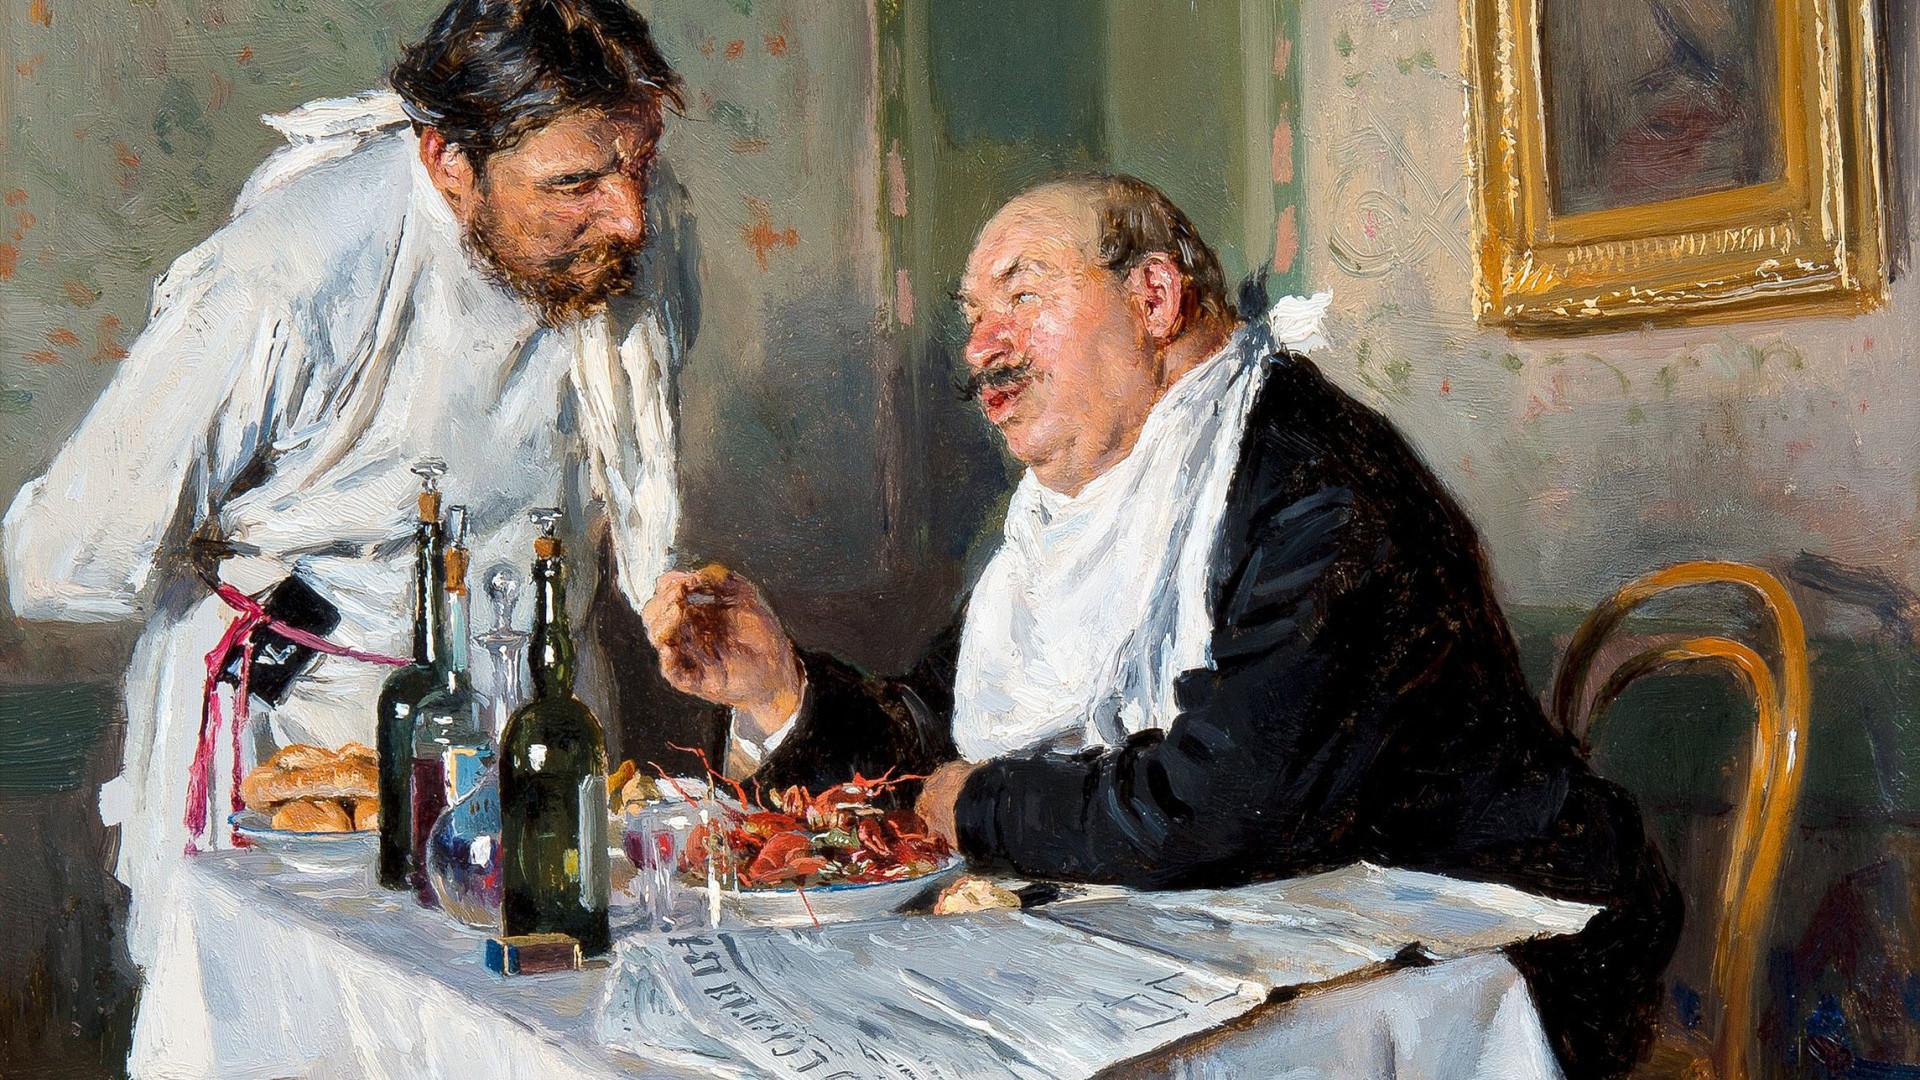 Lukisan berujudul 'Di Kantin' karya Vladimir Makovsky, 1887.